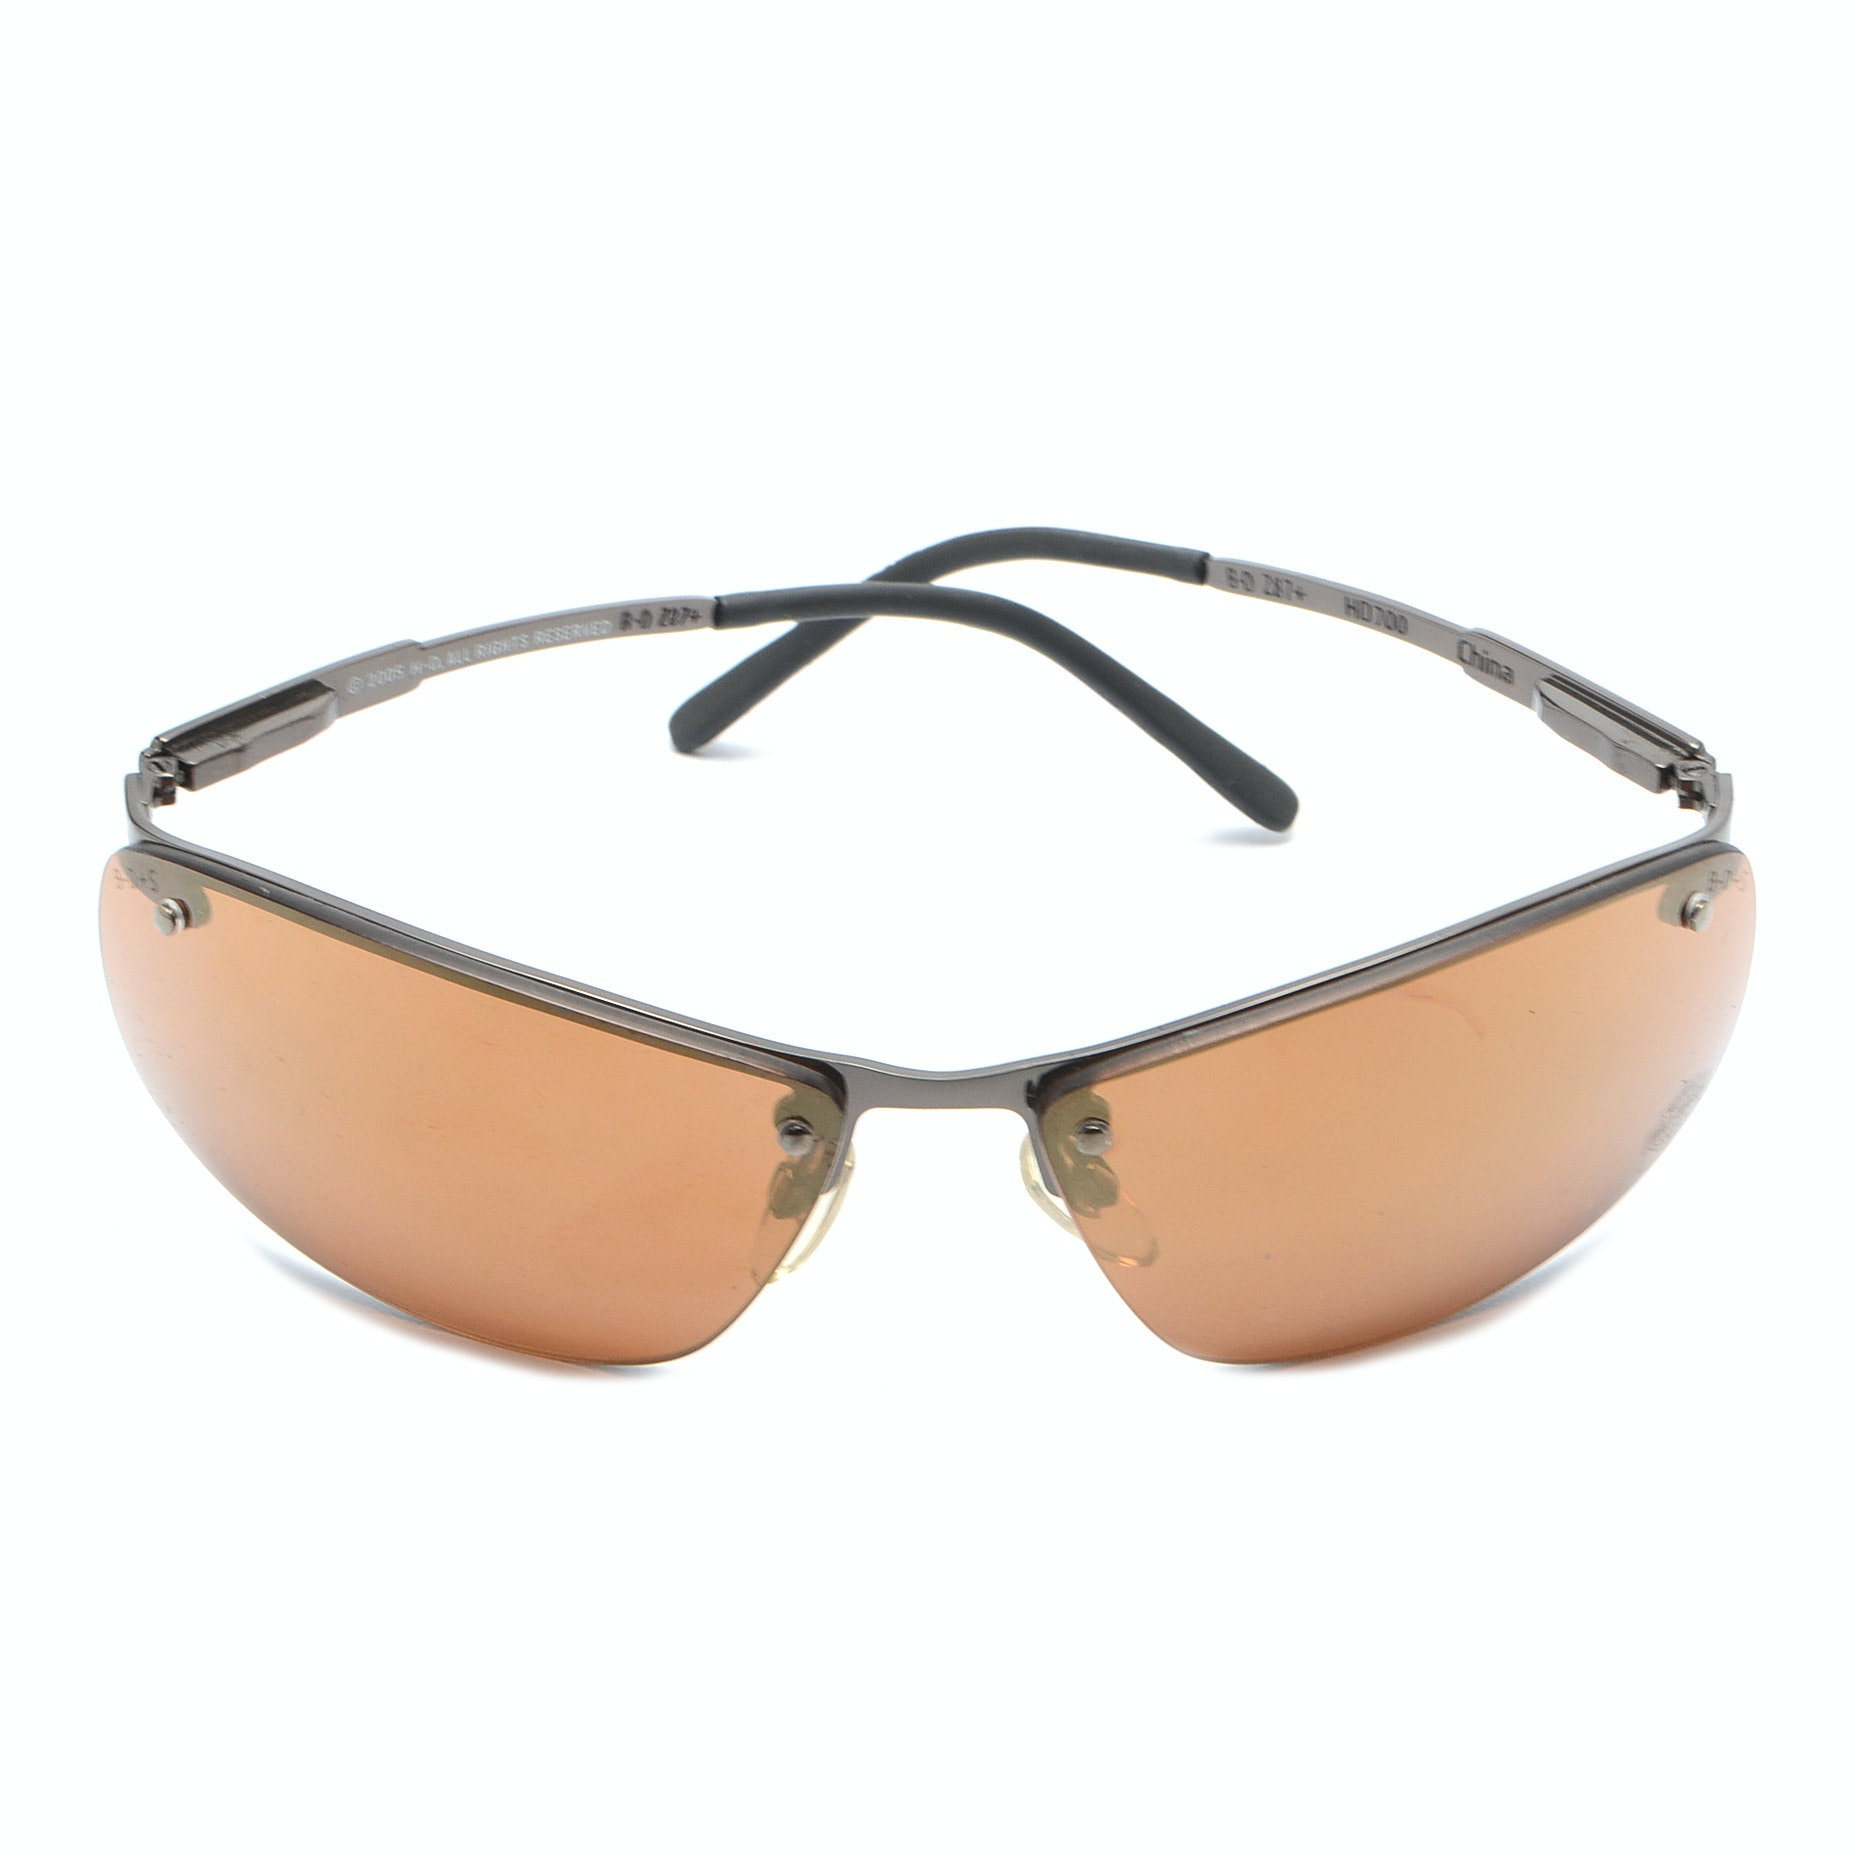 Harley-Davidson Safety Eyewear Sunglasses with Case